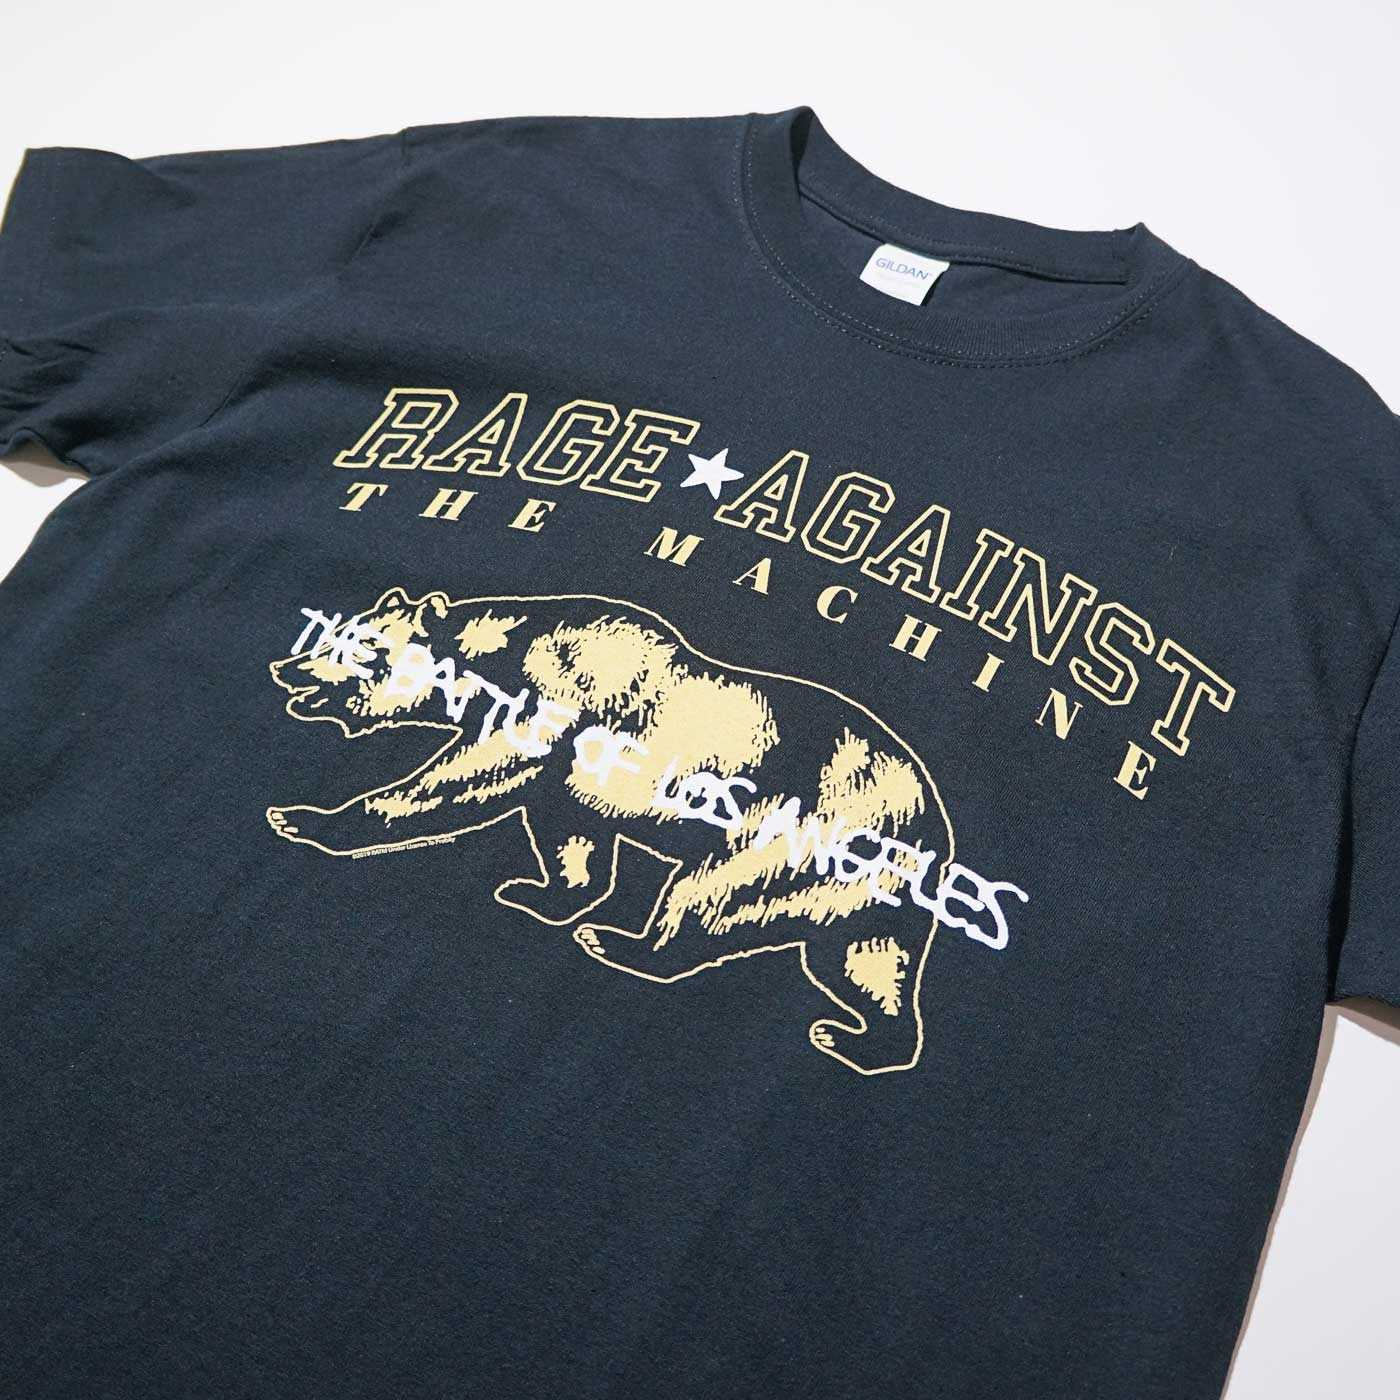 RAGE AGAINST THE MACHINE Tシャツ Cali Bear-Black